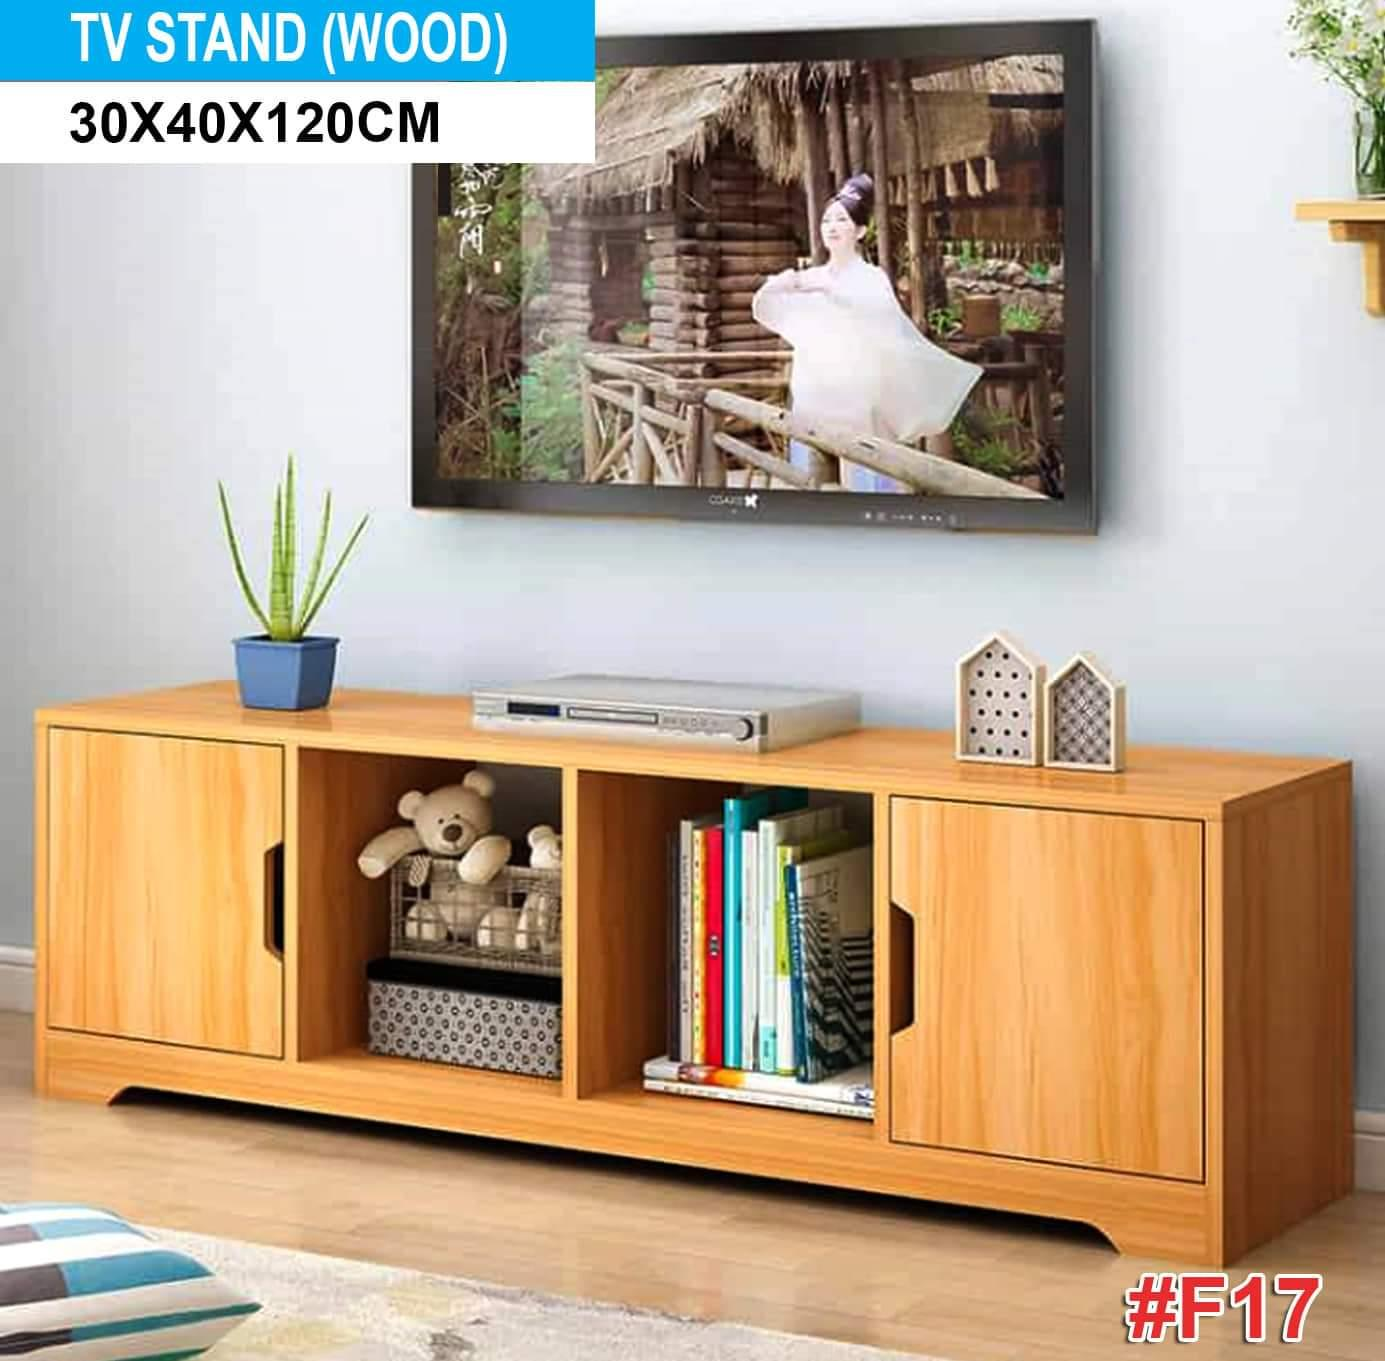 Minimalistic Wooden Tv Stand F17